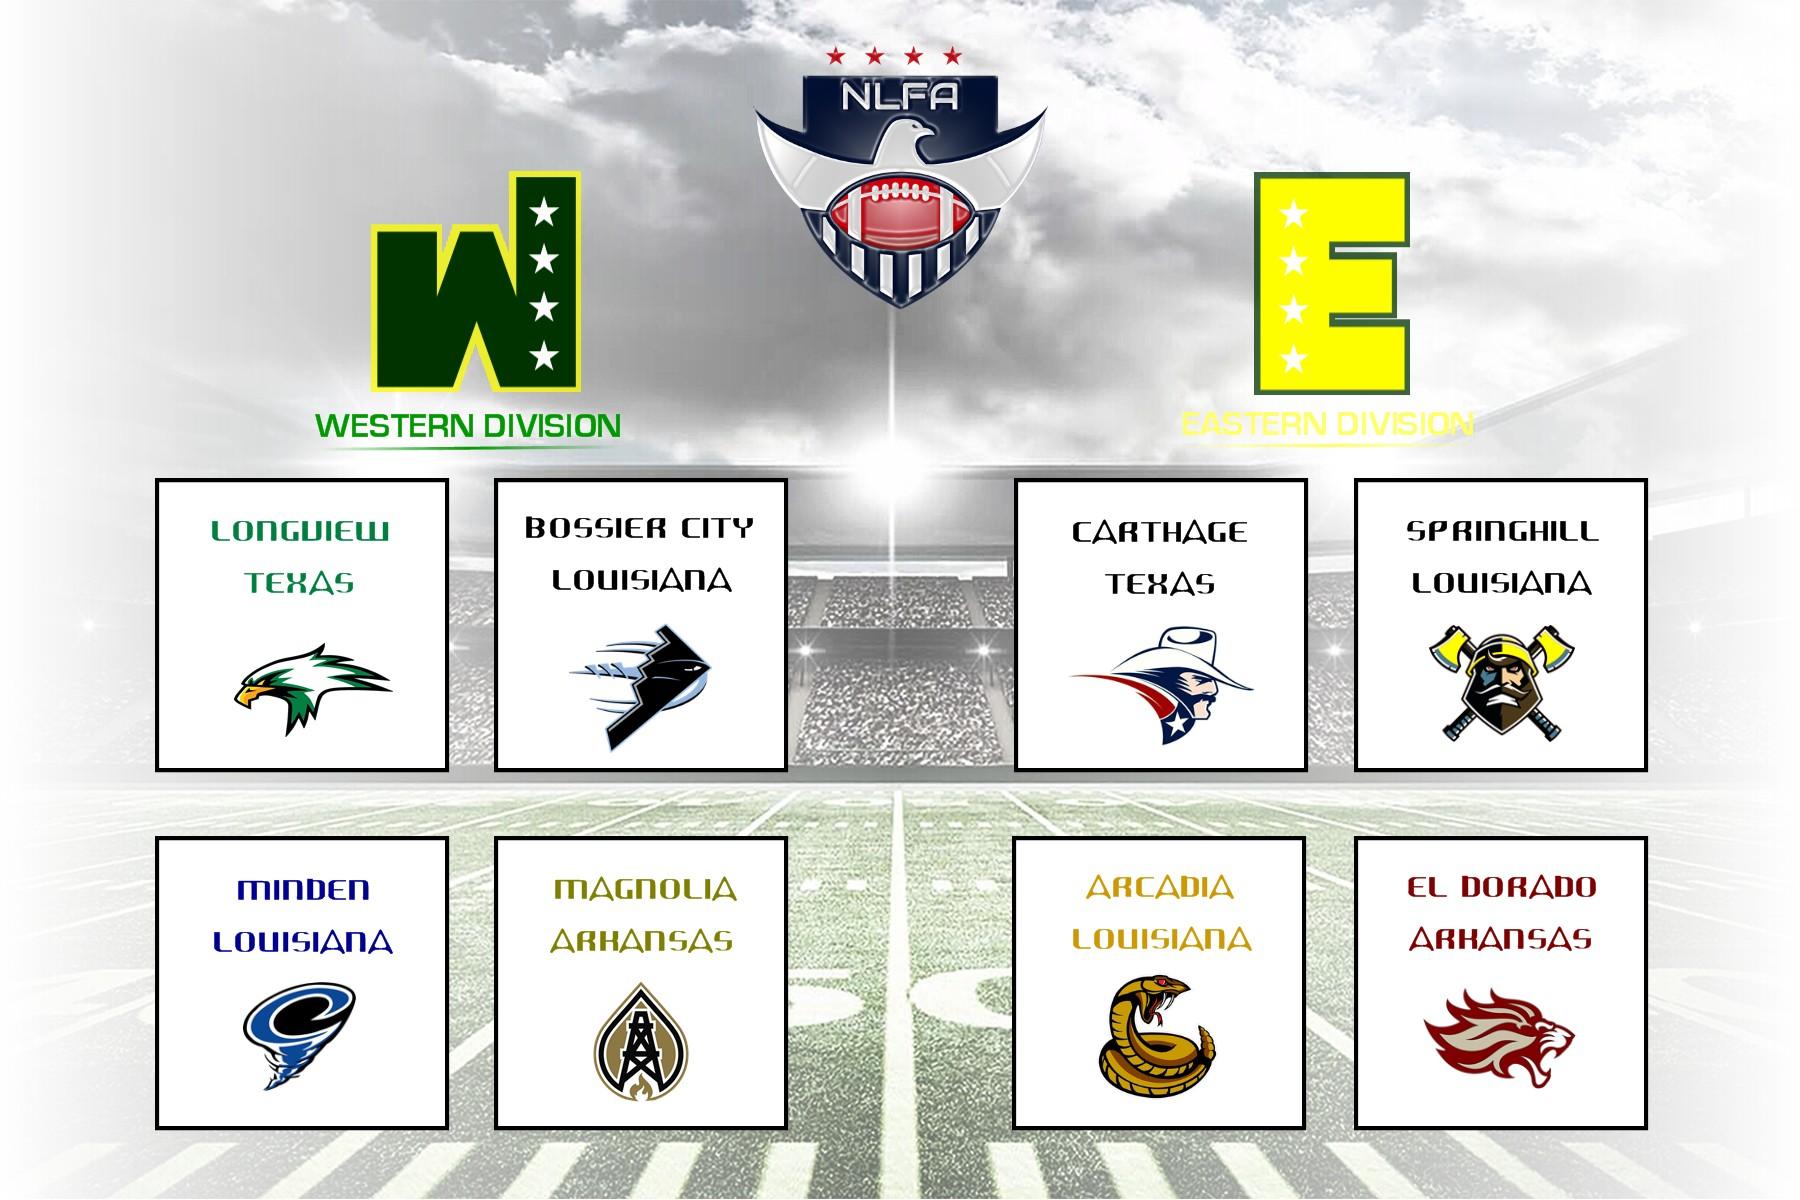 New Semi-Pro Football League Announces Team Names and Logos